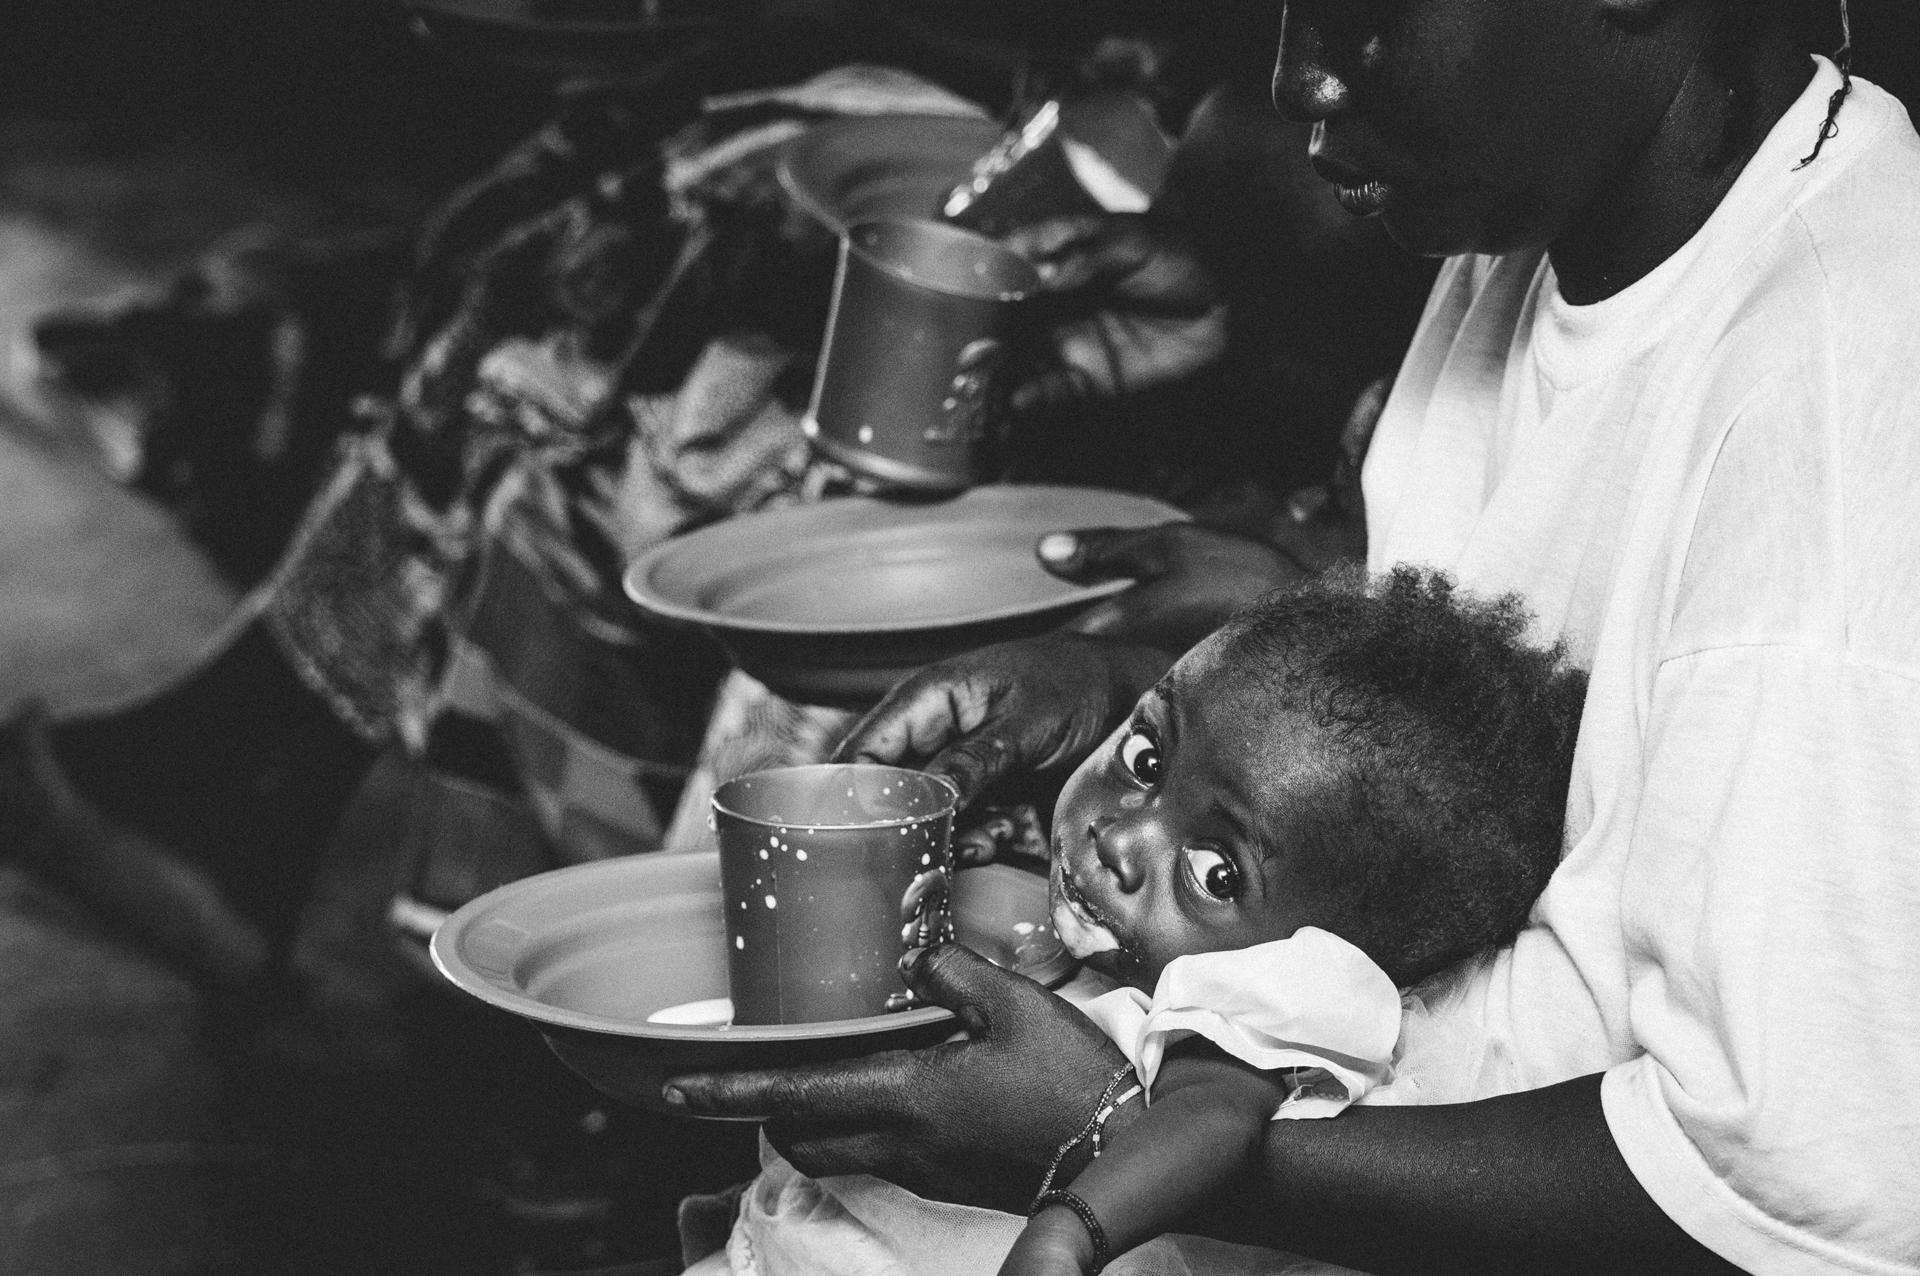 CAUSE Canada Sierra Leone Unicef Malnourished Children